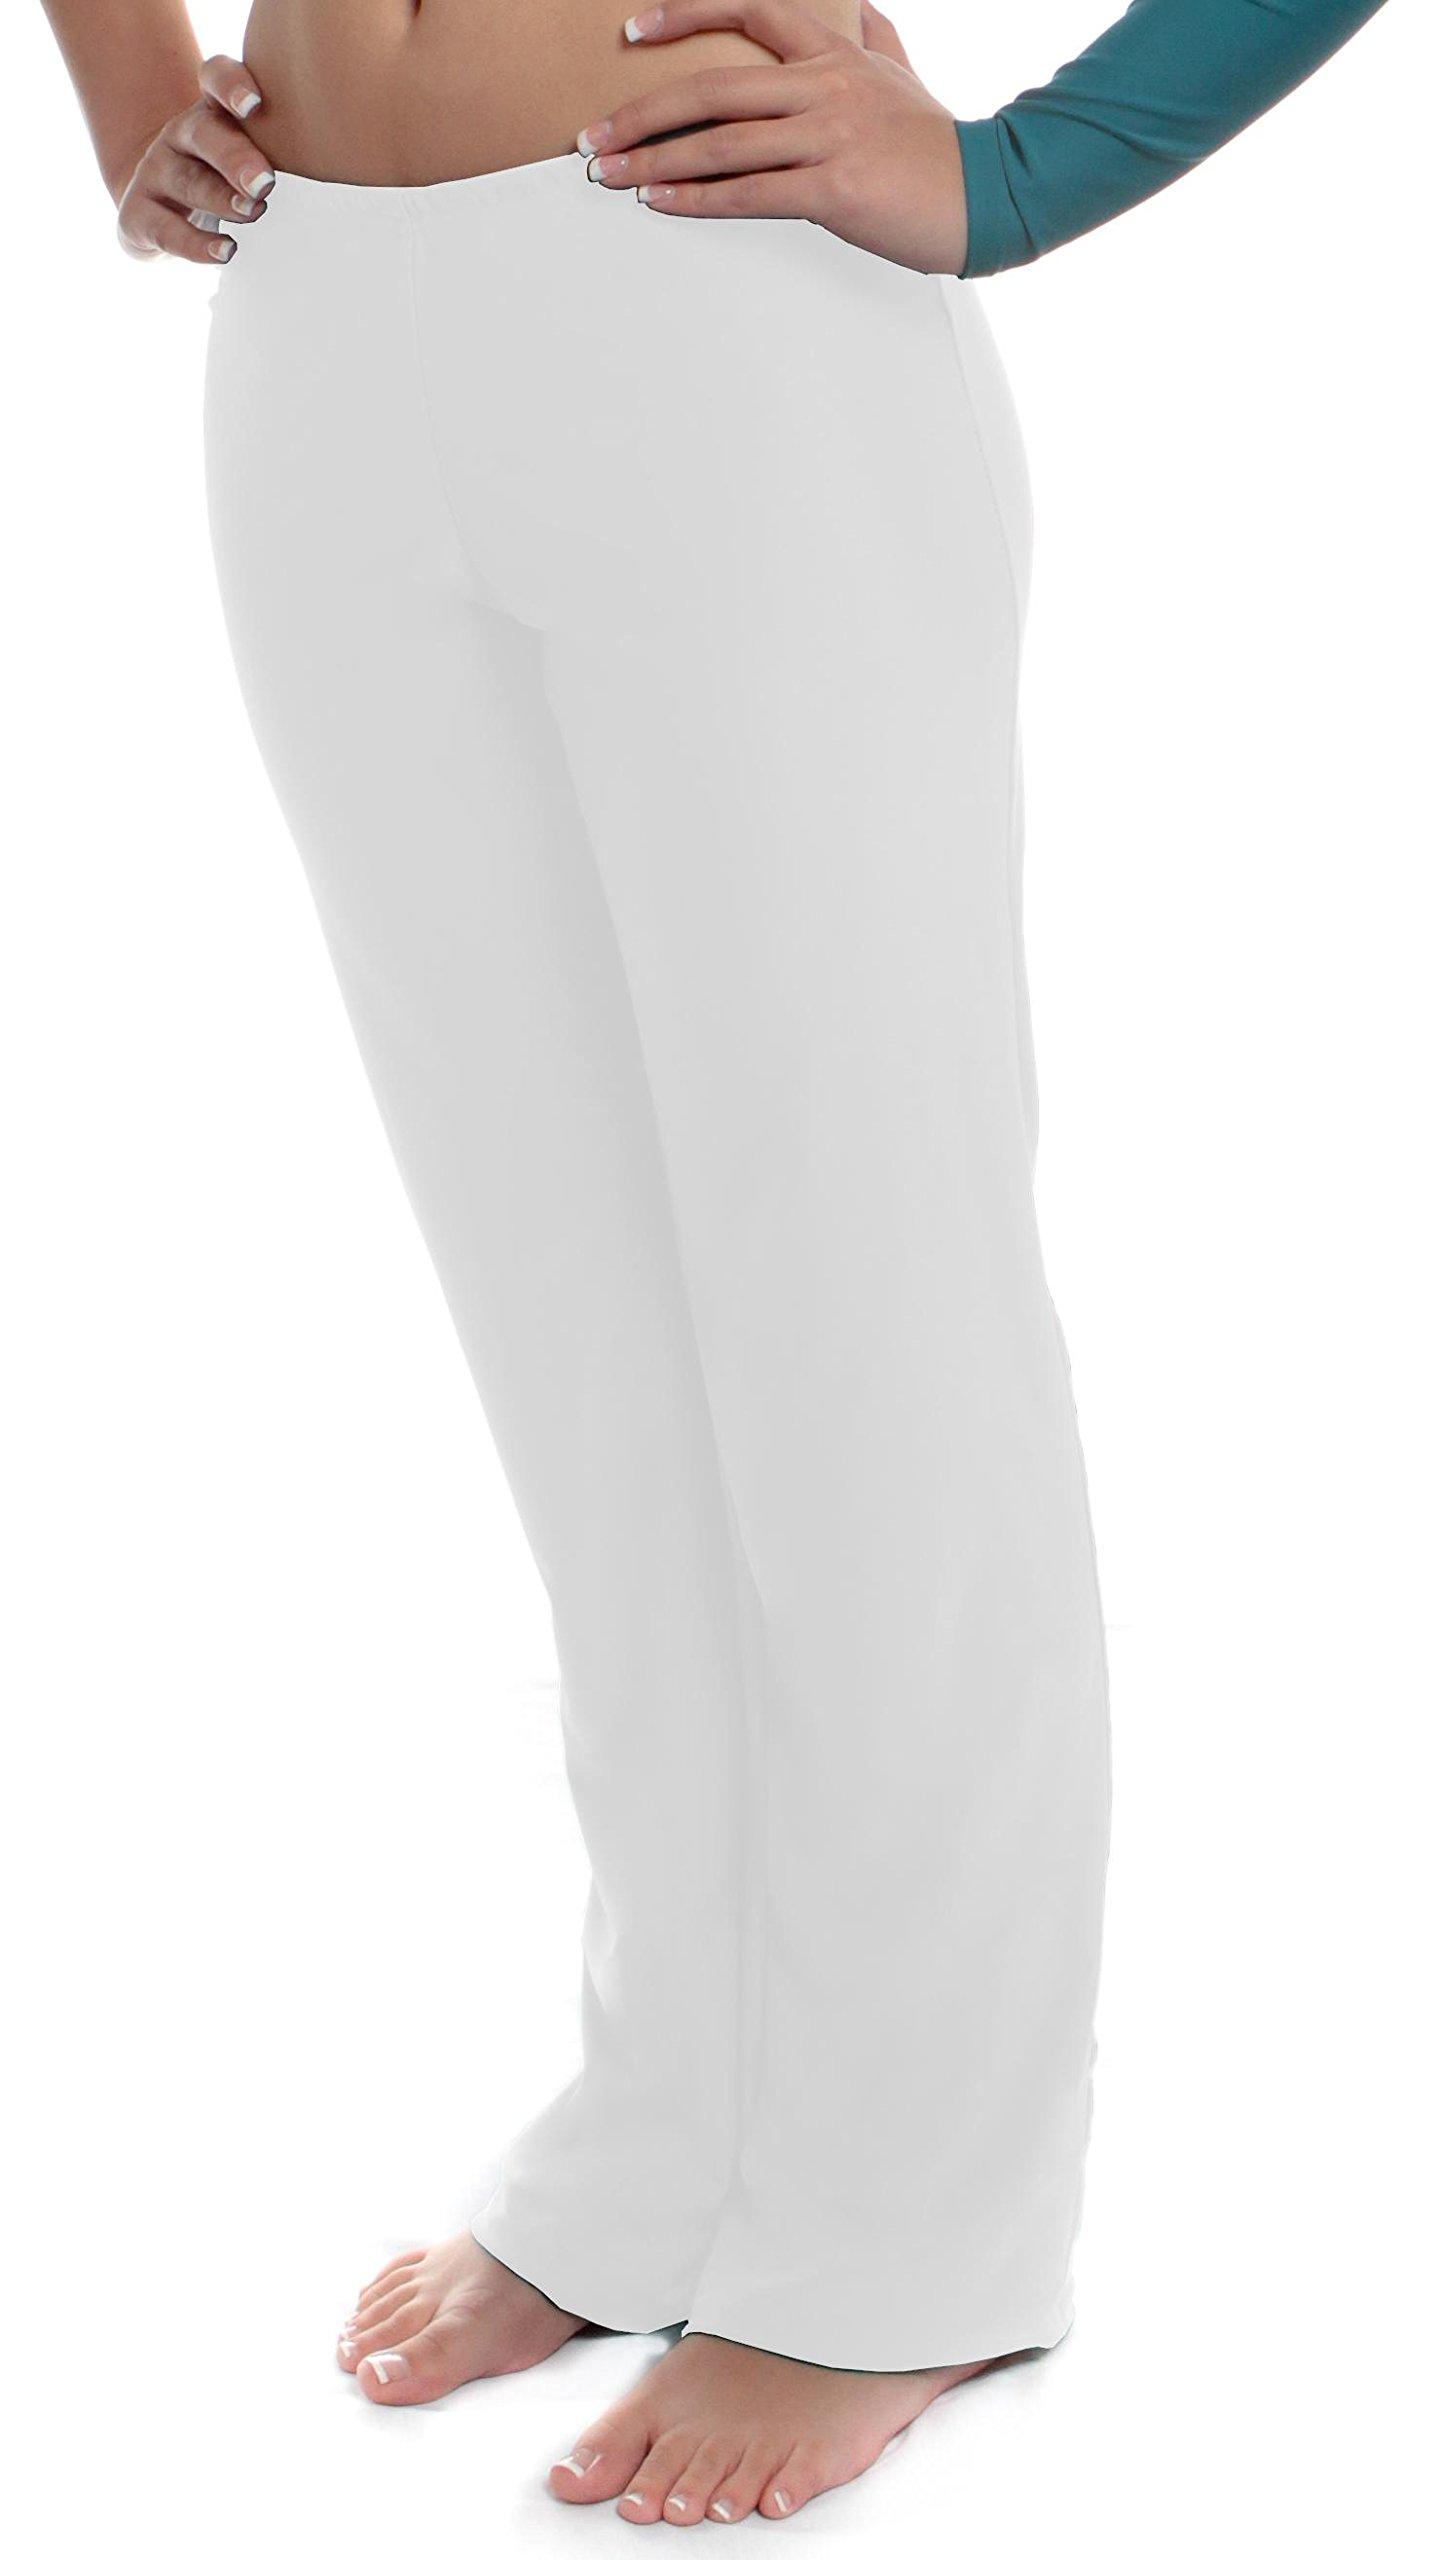 B Dancewear Girls Jazz Pants Medium White Child and Kid Sizes by B Dancewear